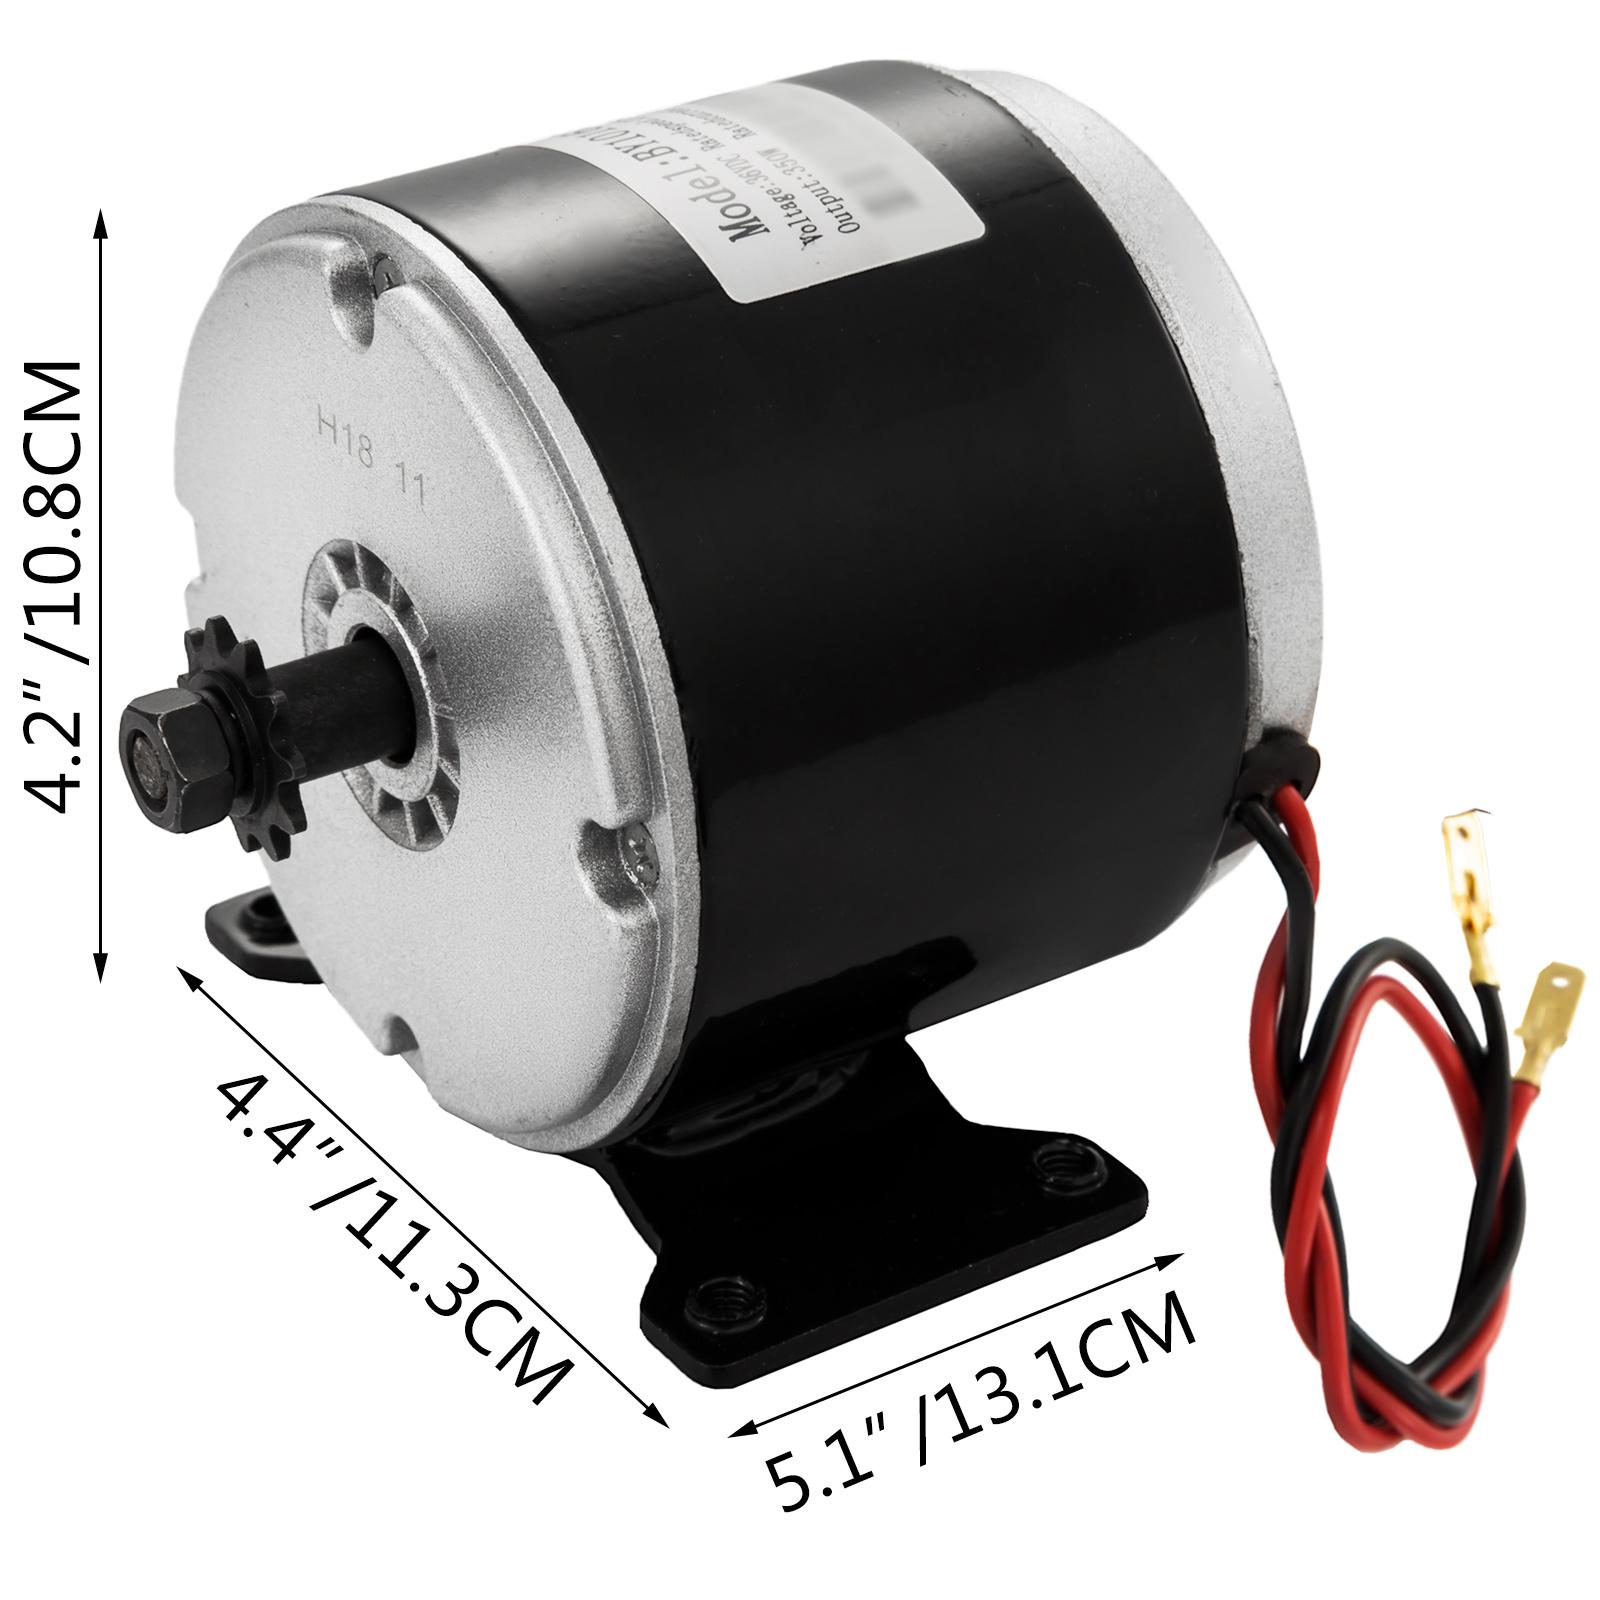 DC-electric-motor-12-60V-150W-2KW-for-scooter-bike-go-kart-minibike-e-ATV thumbnail 80